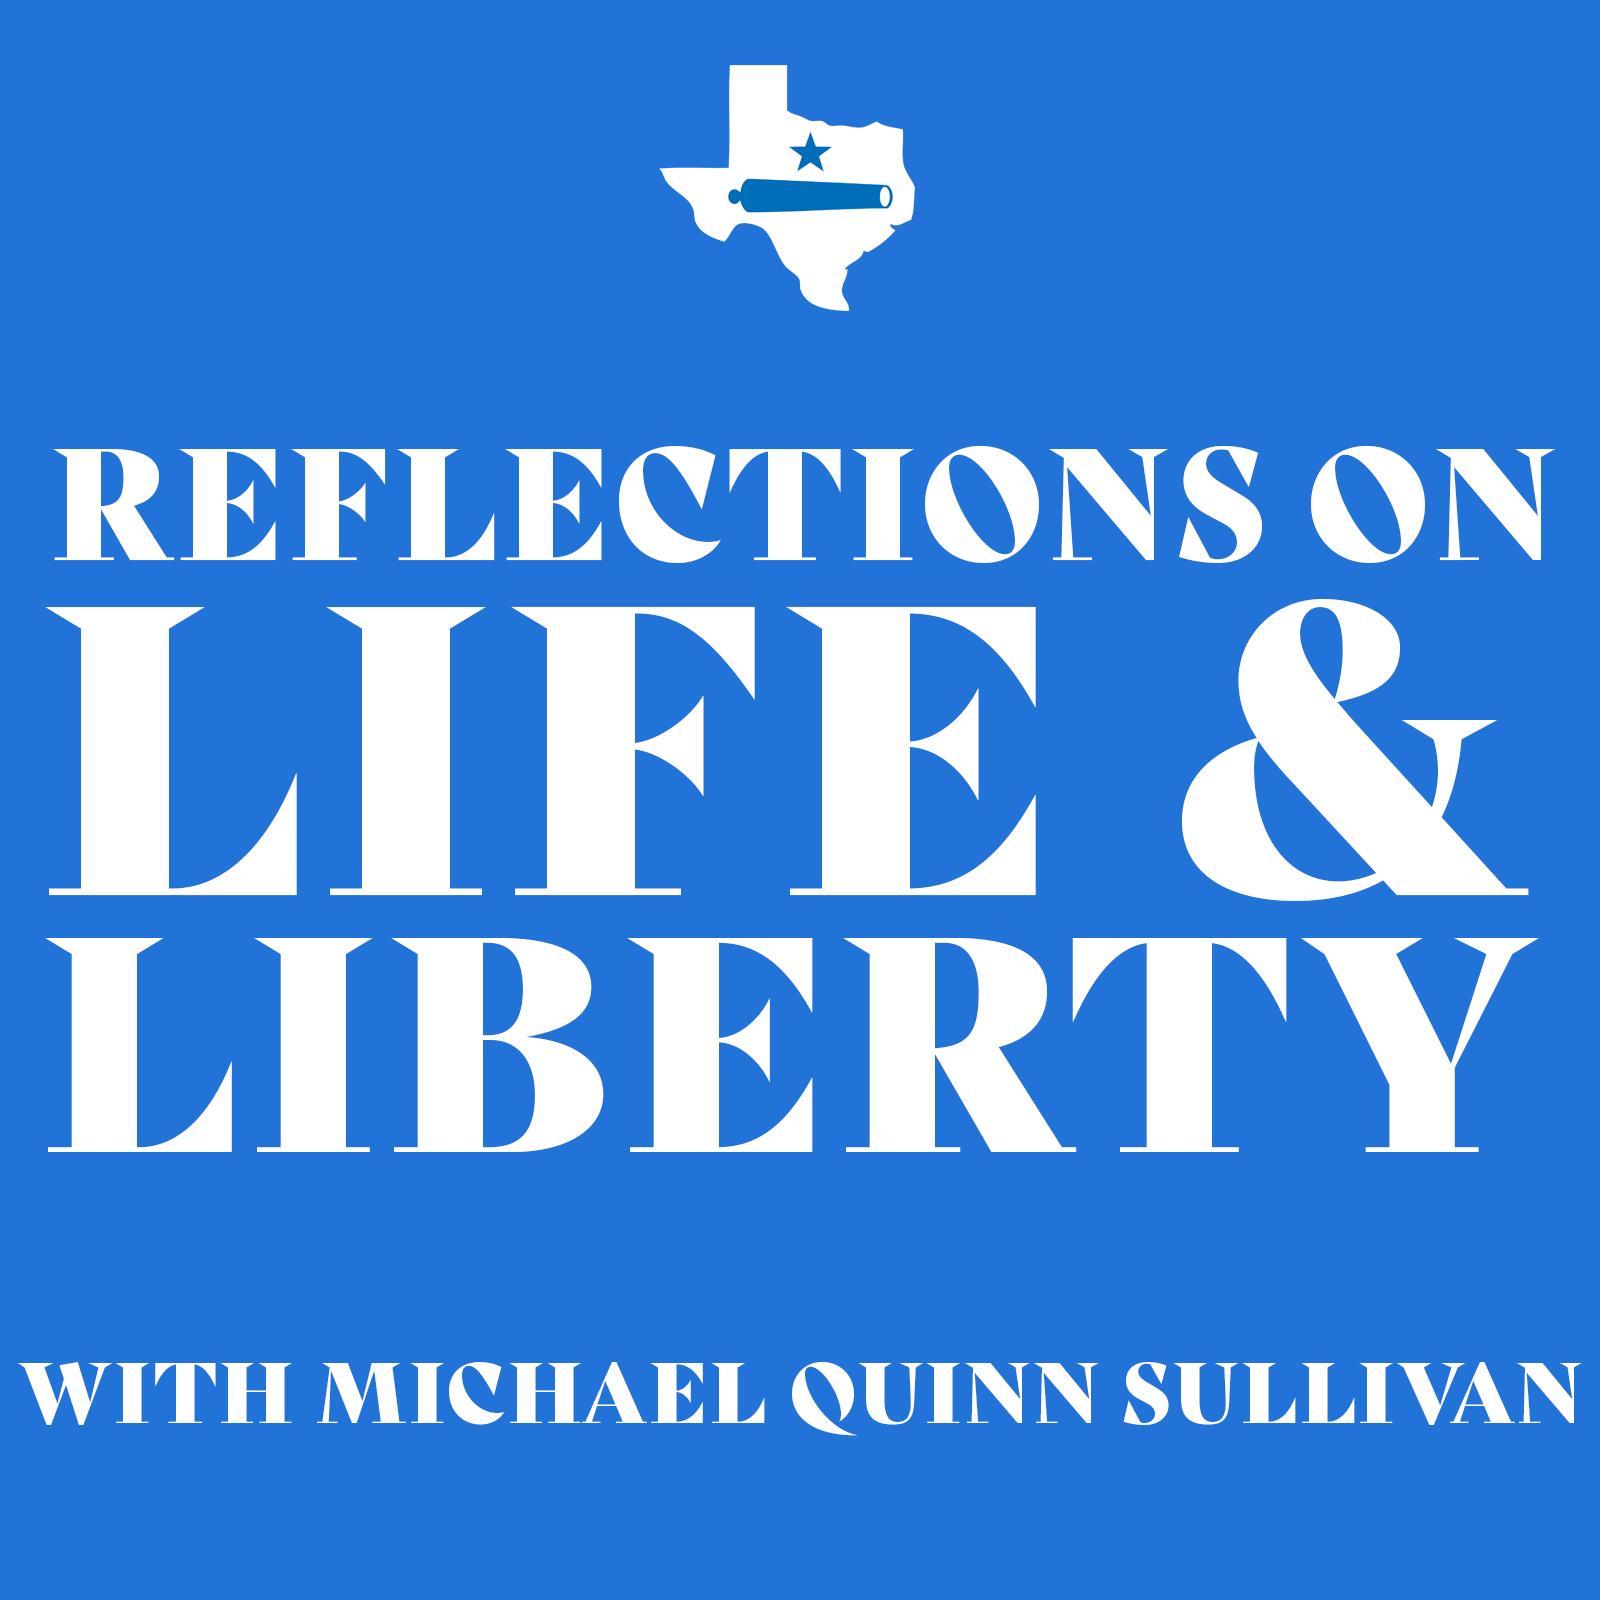 Reflections on Life & Liberty